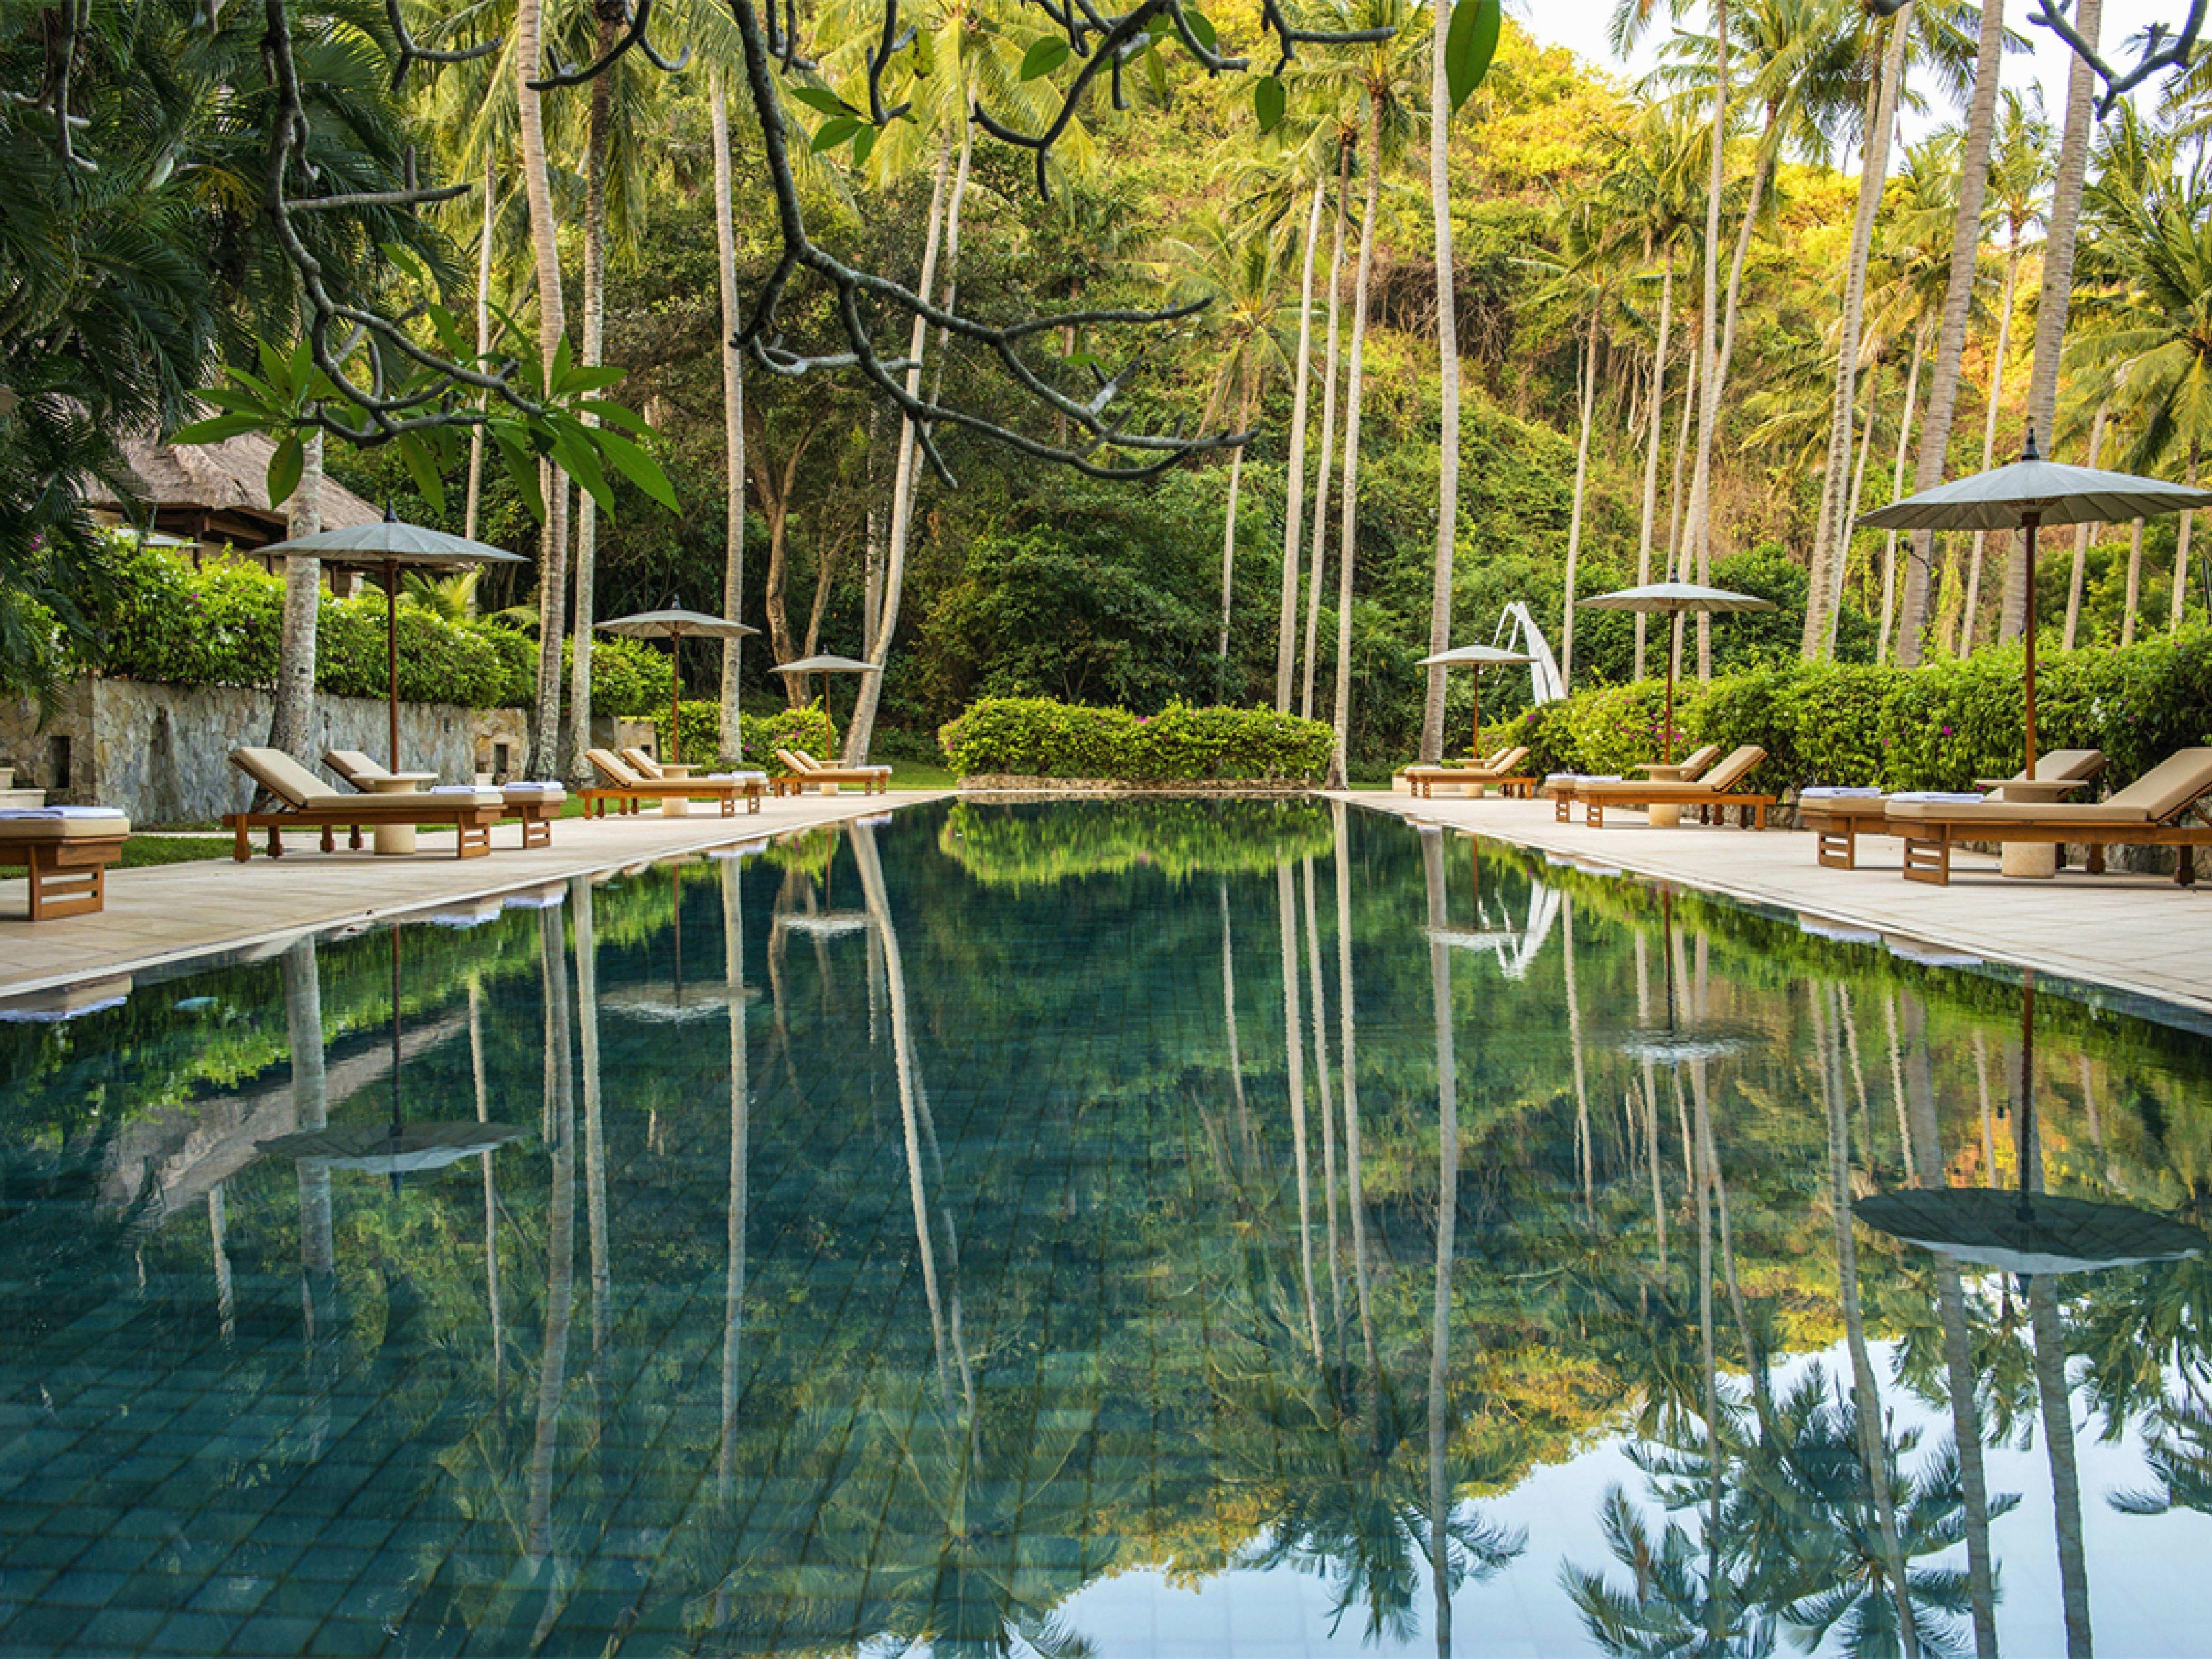 50 Gorgeous Aquascape Okc Outdoor Swimming Pool Ideas Bali Resort Luxury Hotels Bali Most Luxurious Hotels